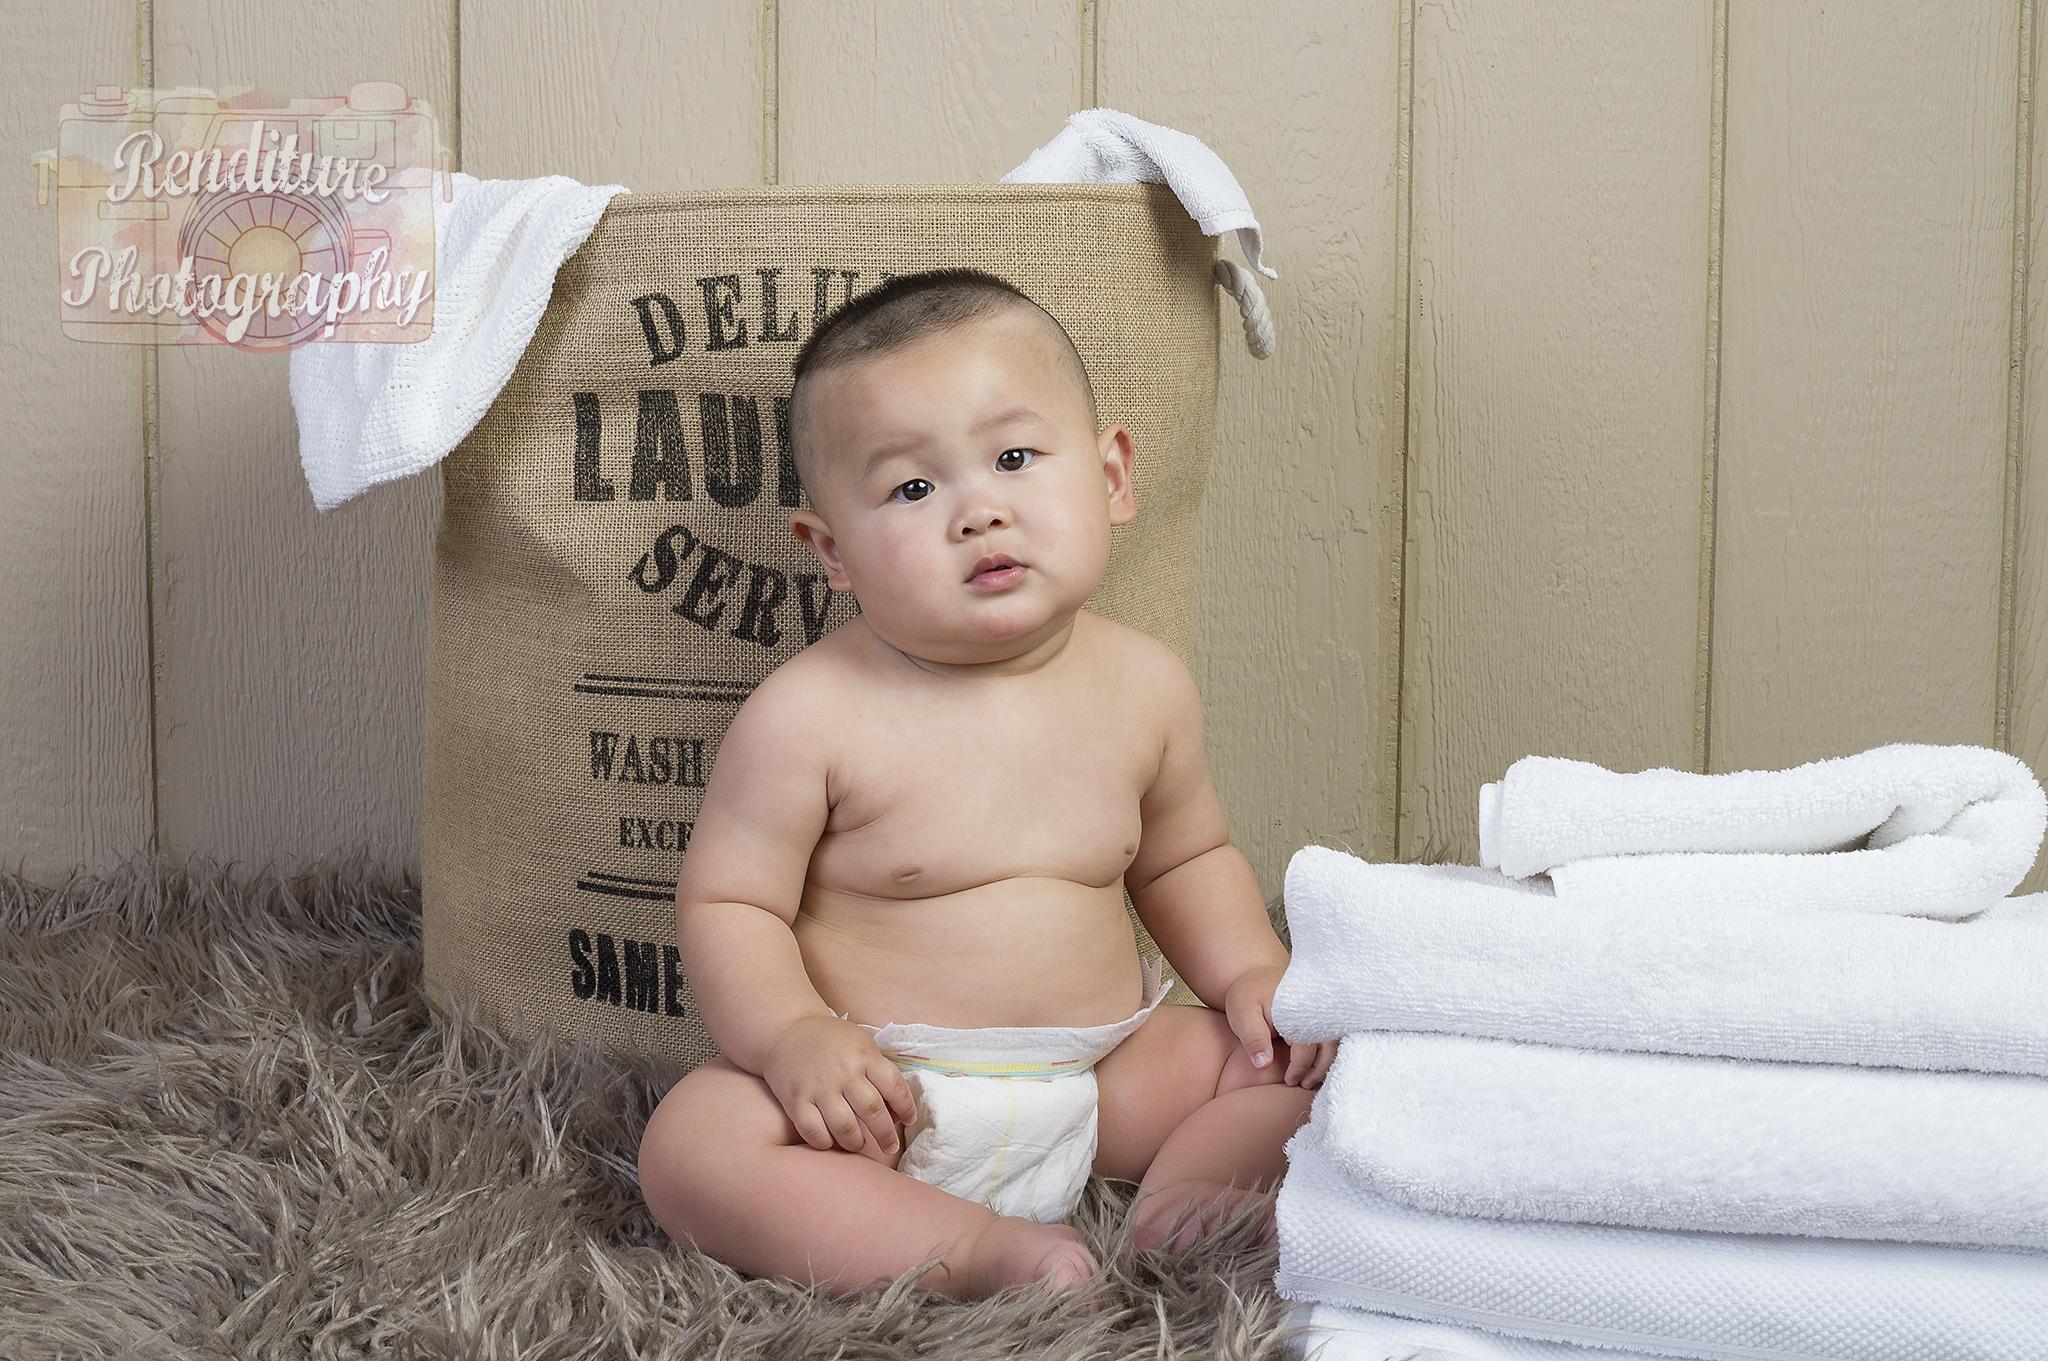 Saskatoon-Newborn-Family-Renditure-Baby-Photography-Photographer-Maternity-Pregnancy-Saskatchewan-226 FBR.jpg